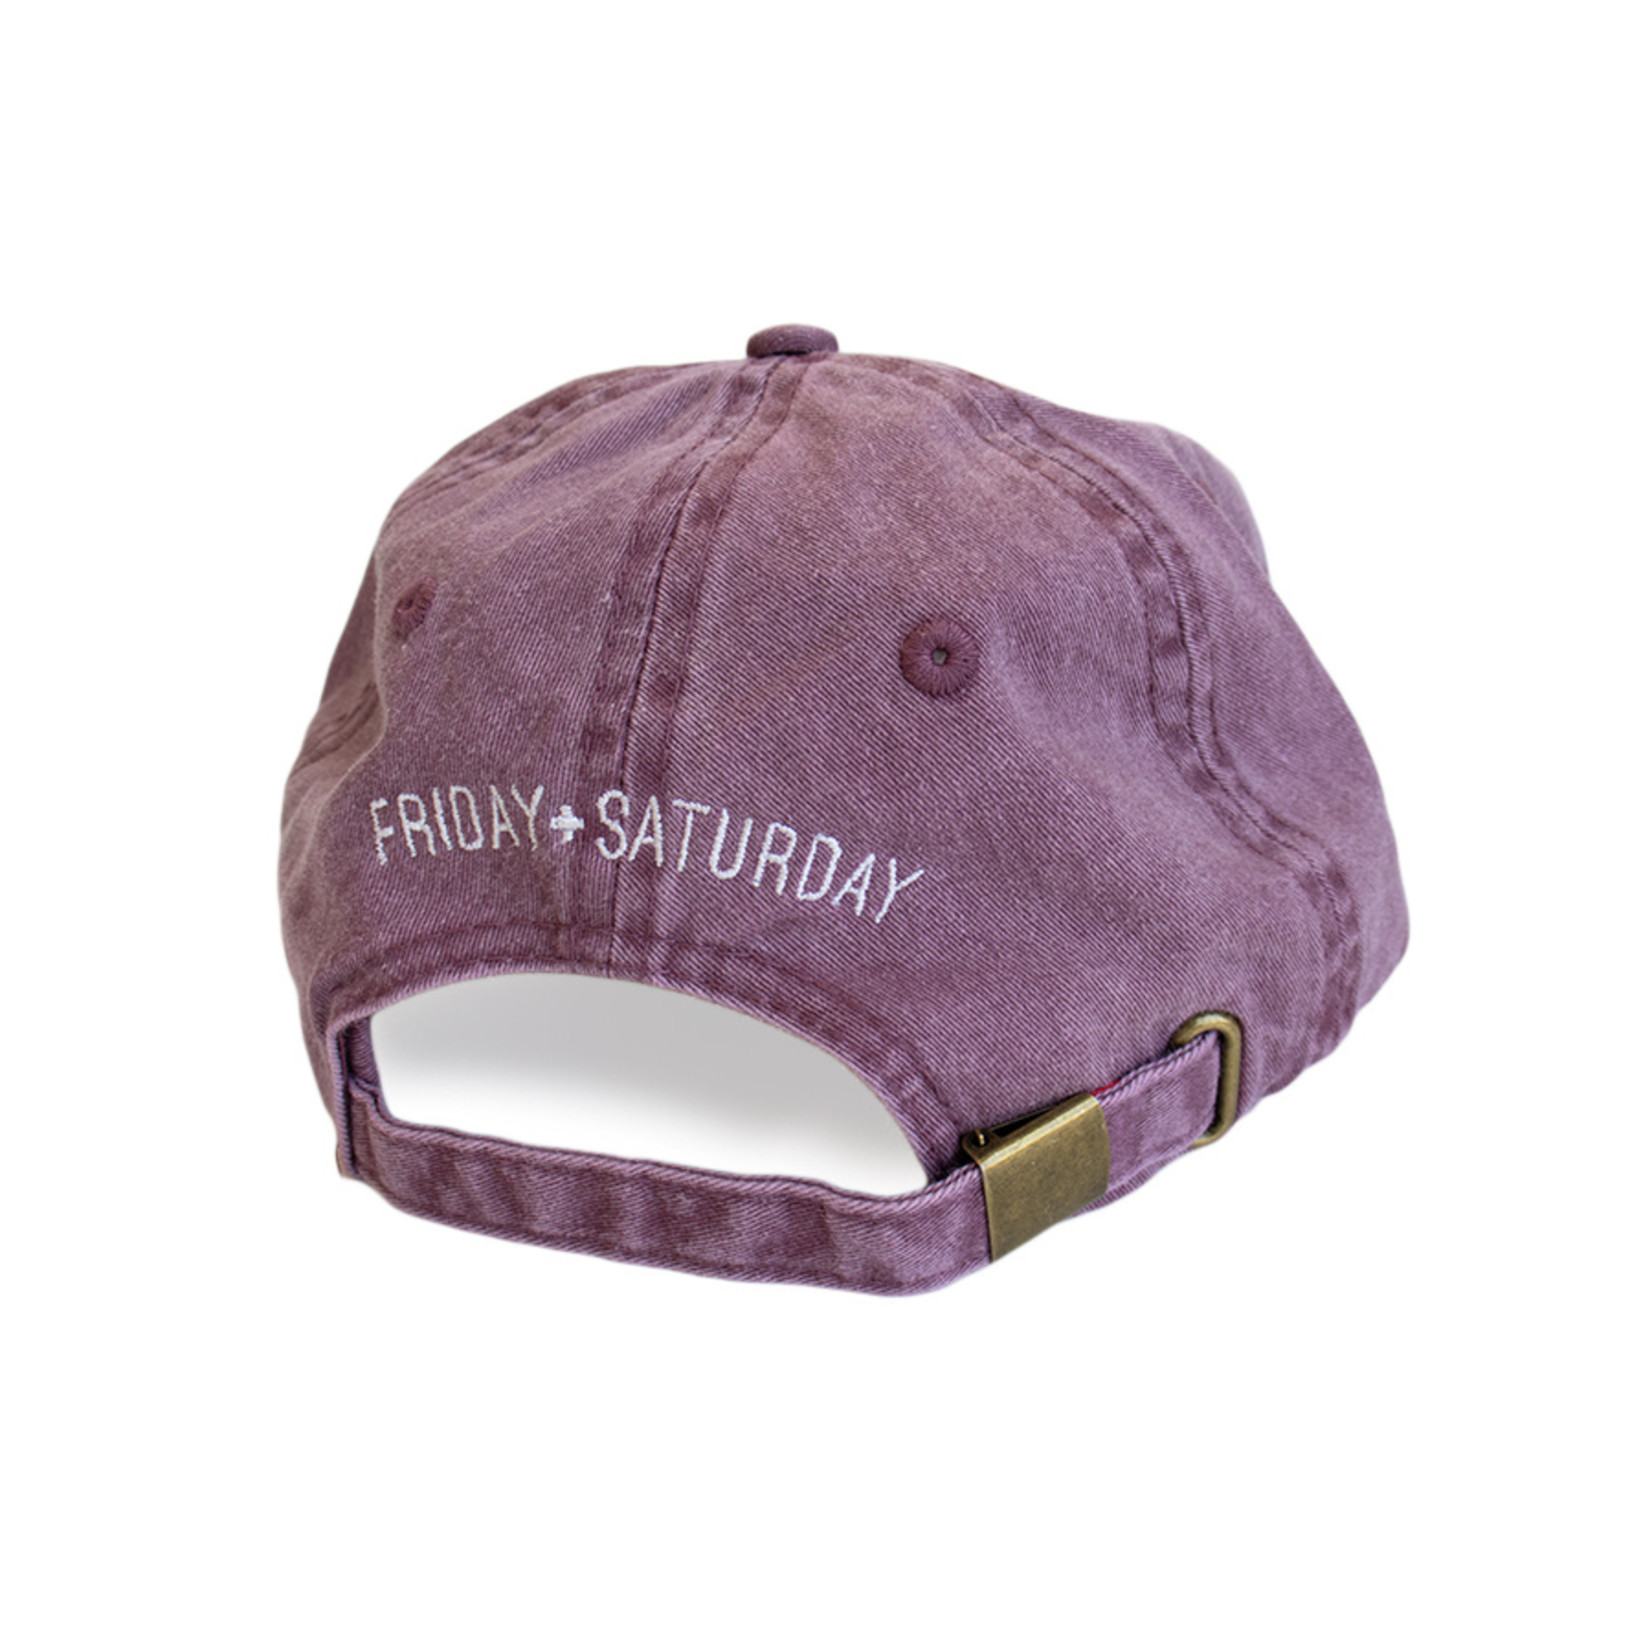 FRIDAY + SATURDAY Weekend Hat